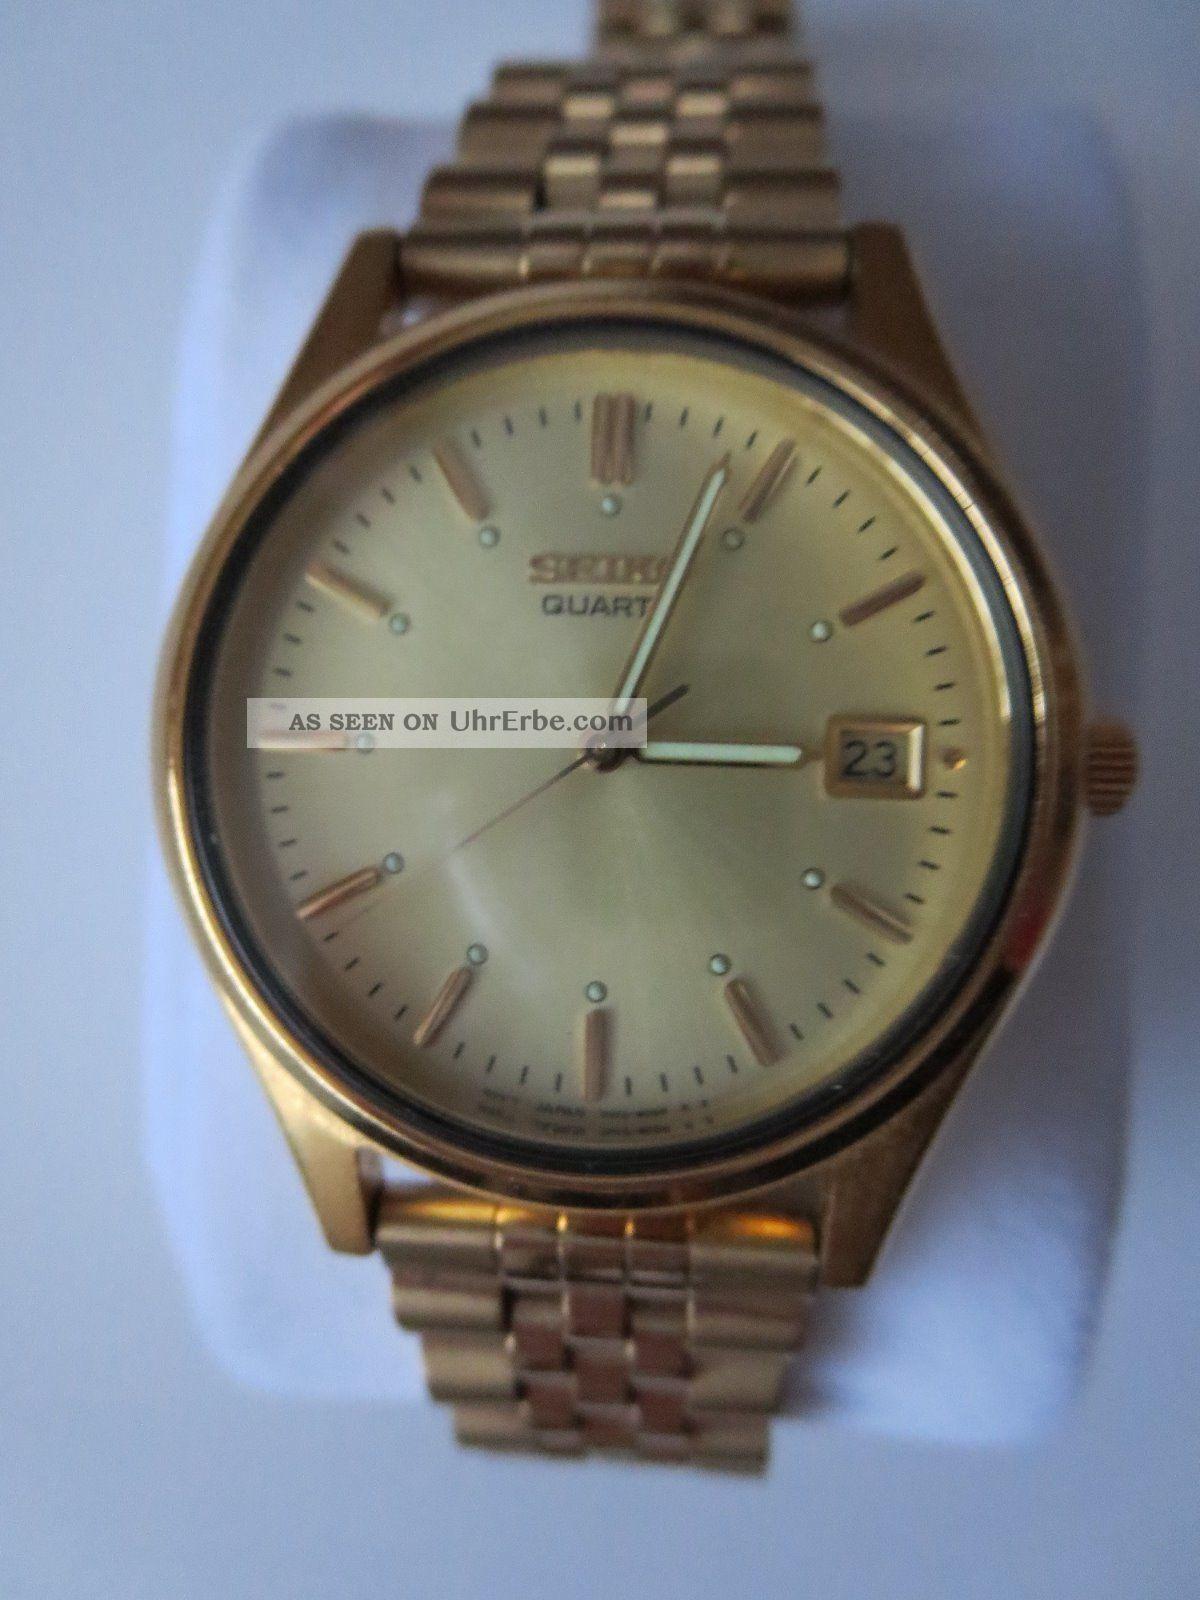 Seiko Quartz - Uhr Mit Datumsanzeige Armbanduhren Bild